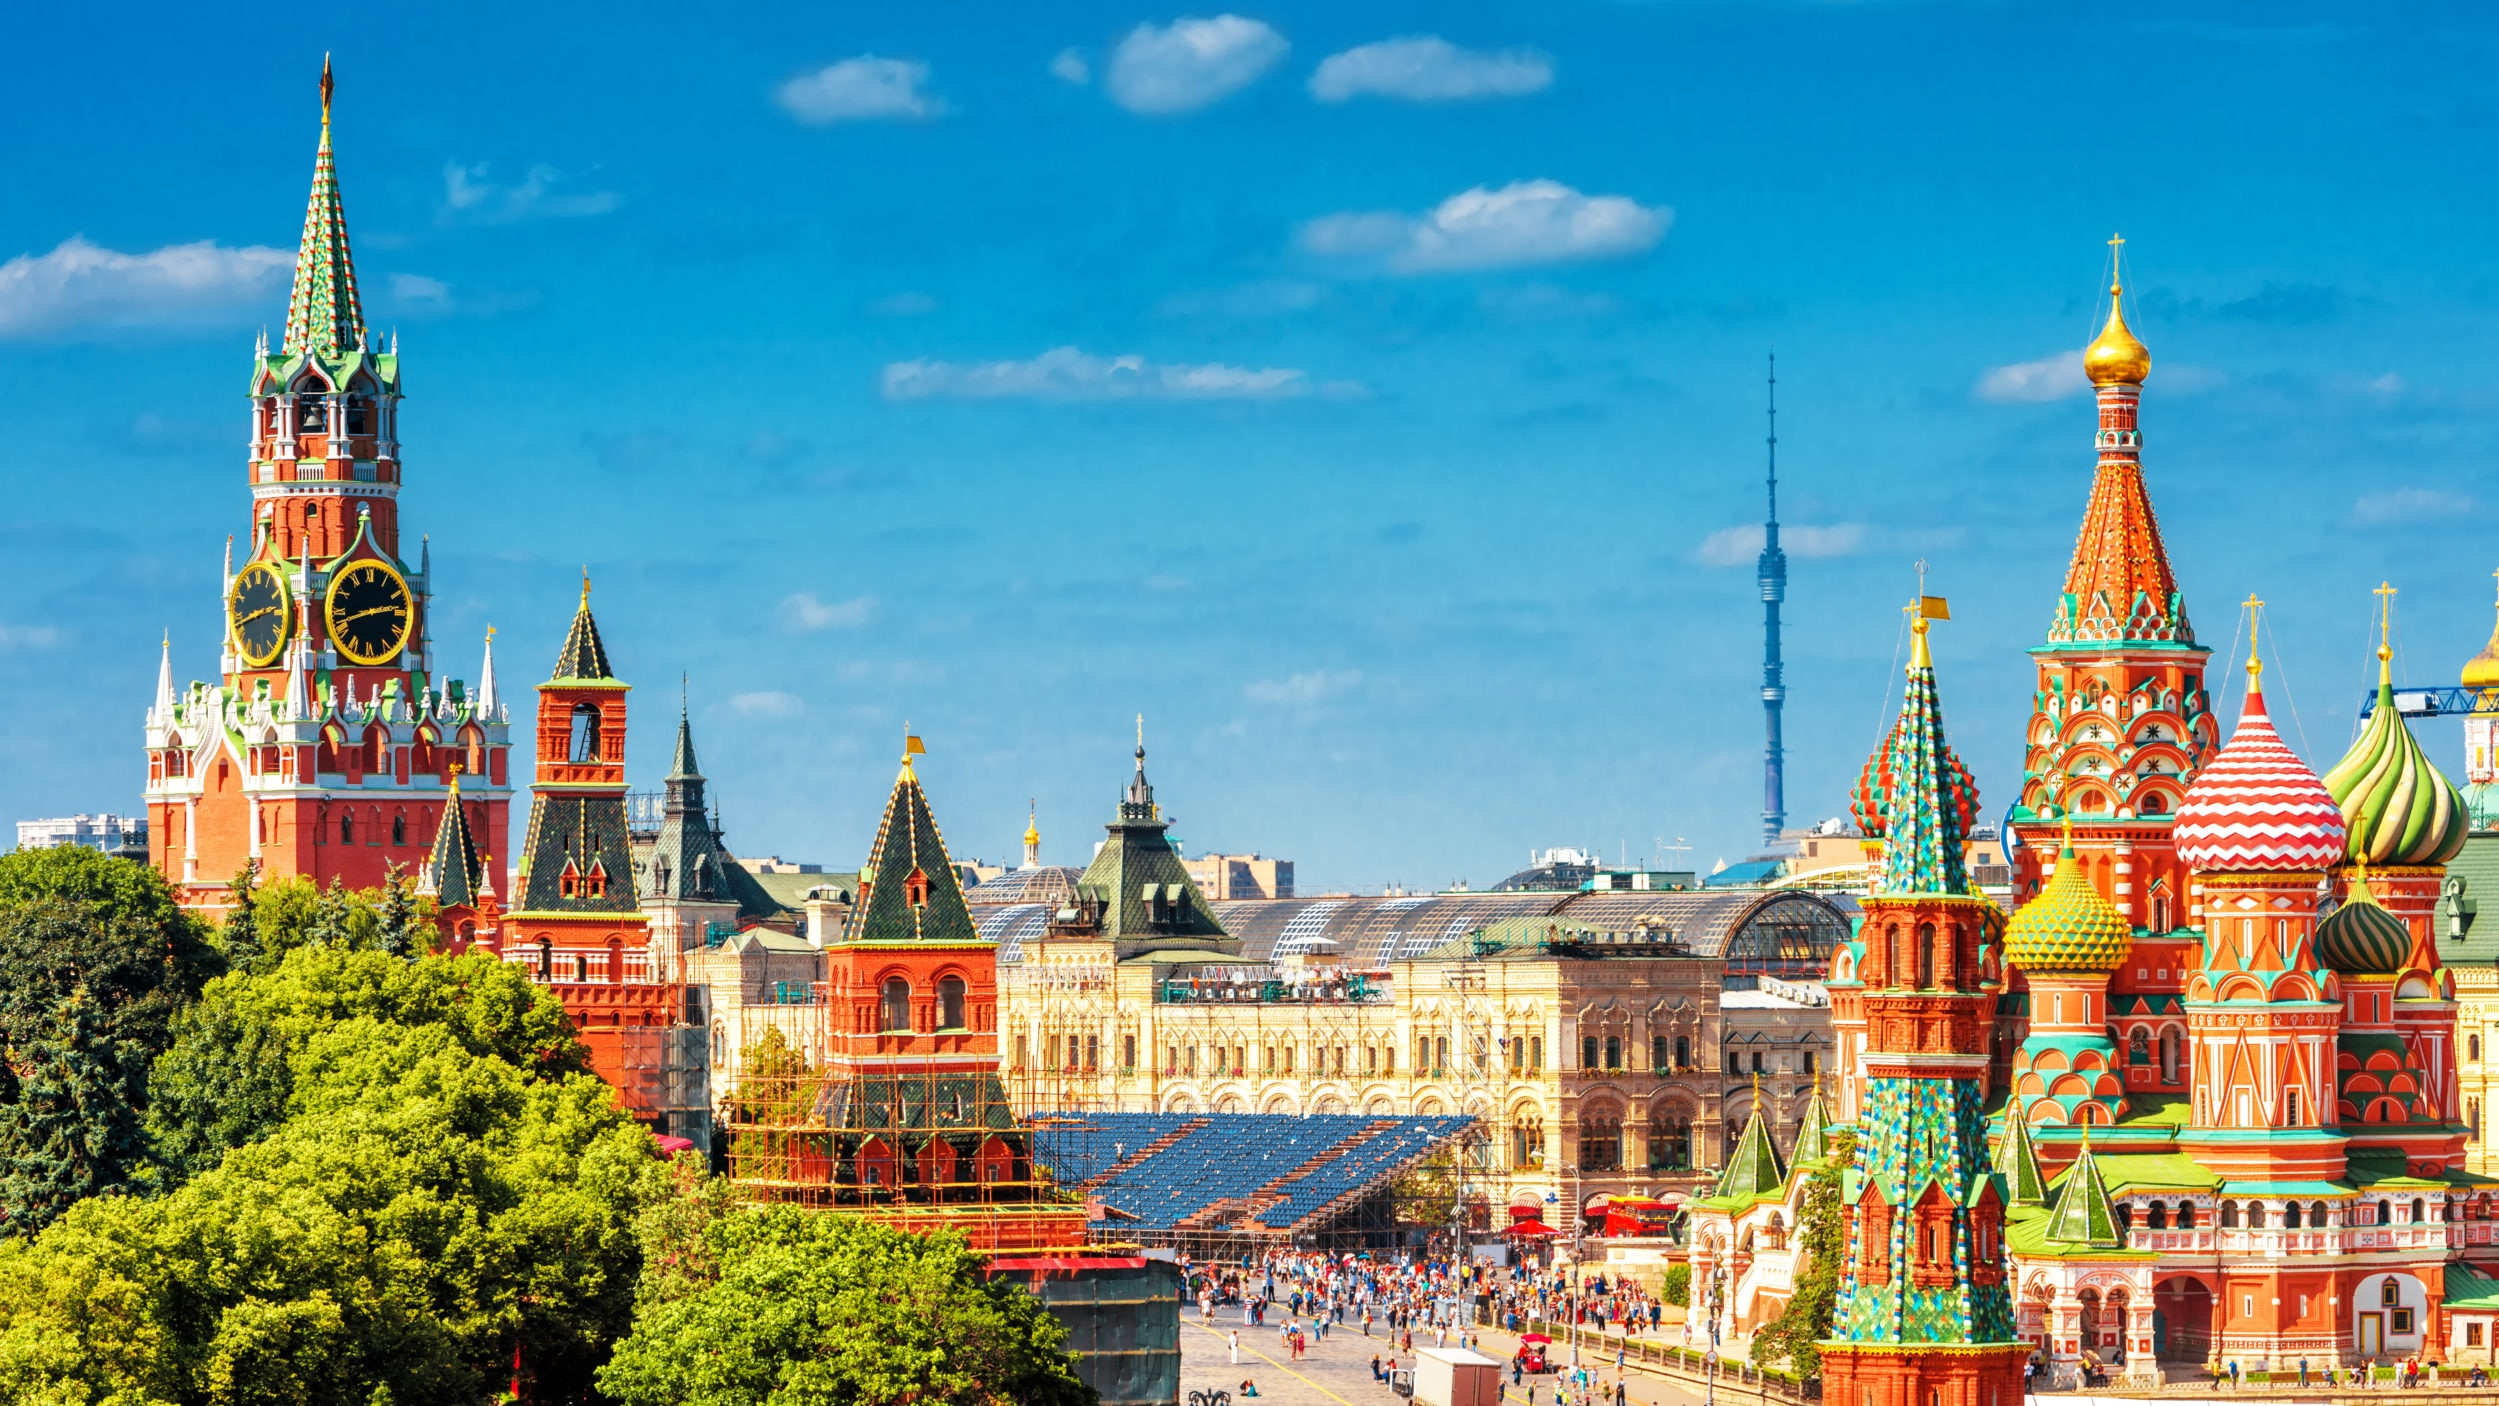 Russia [Shutterstock]